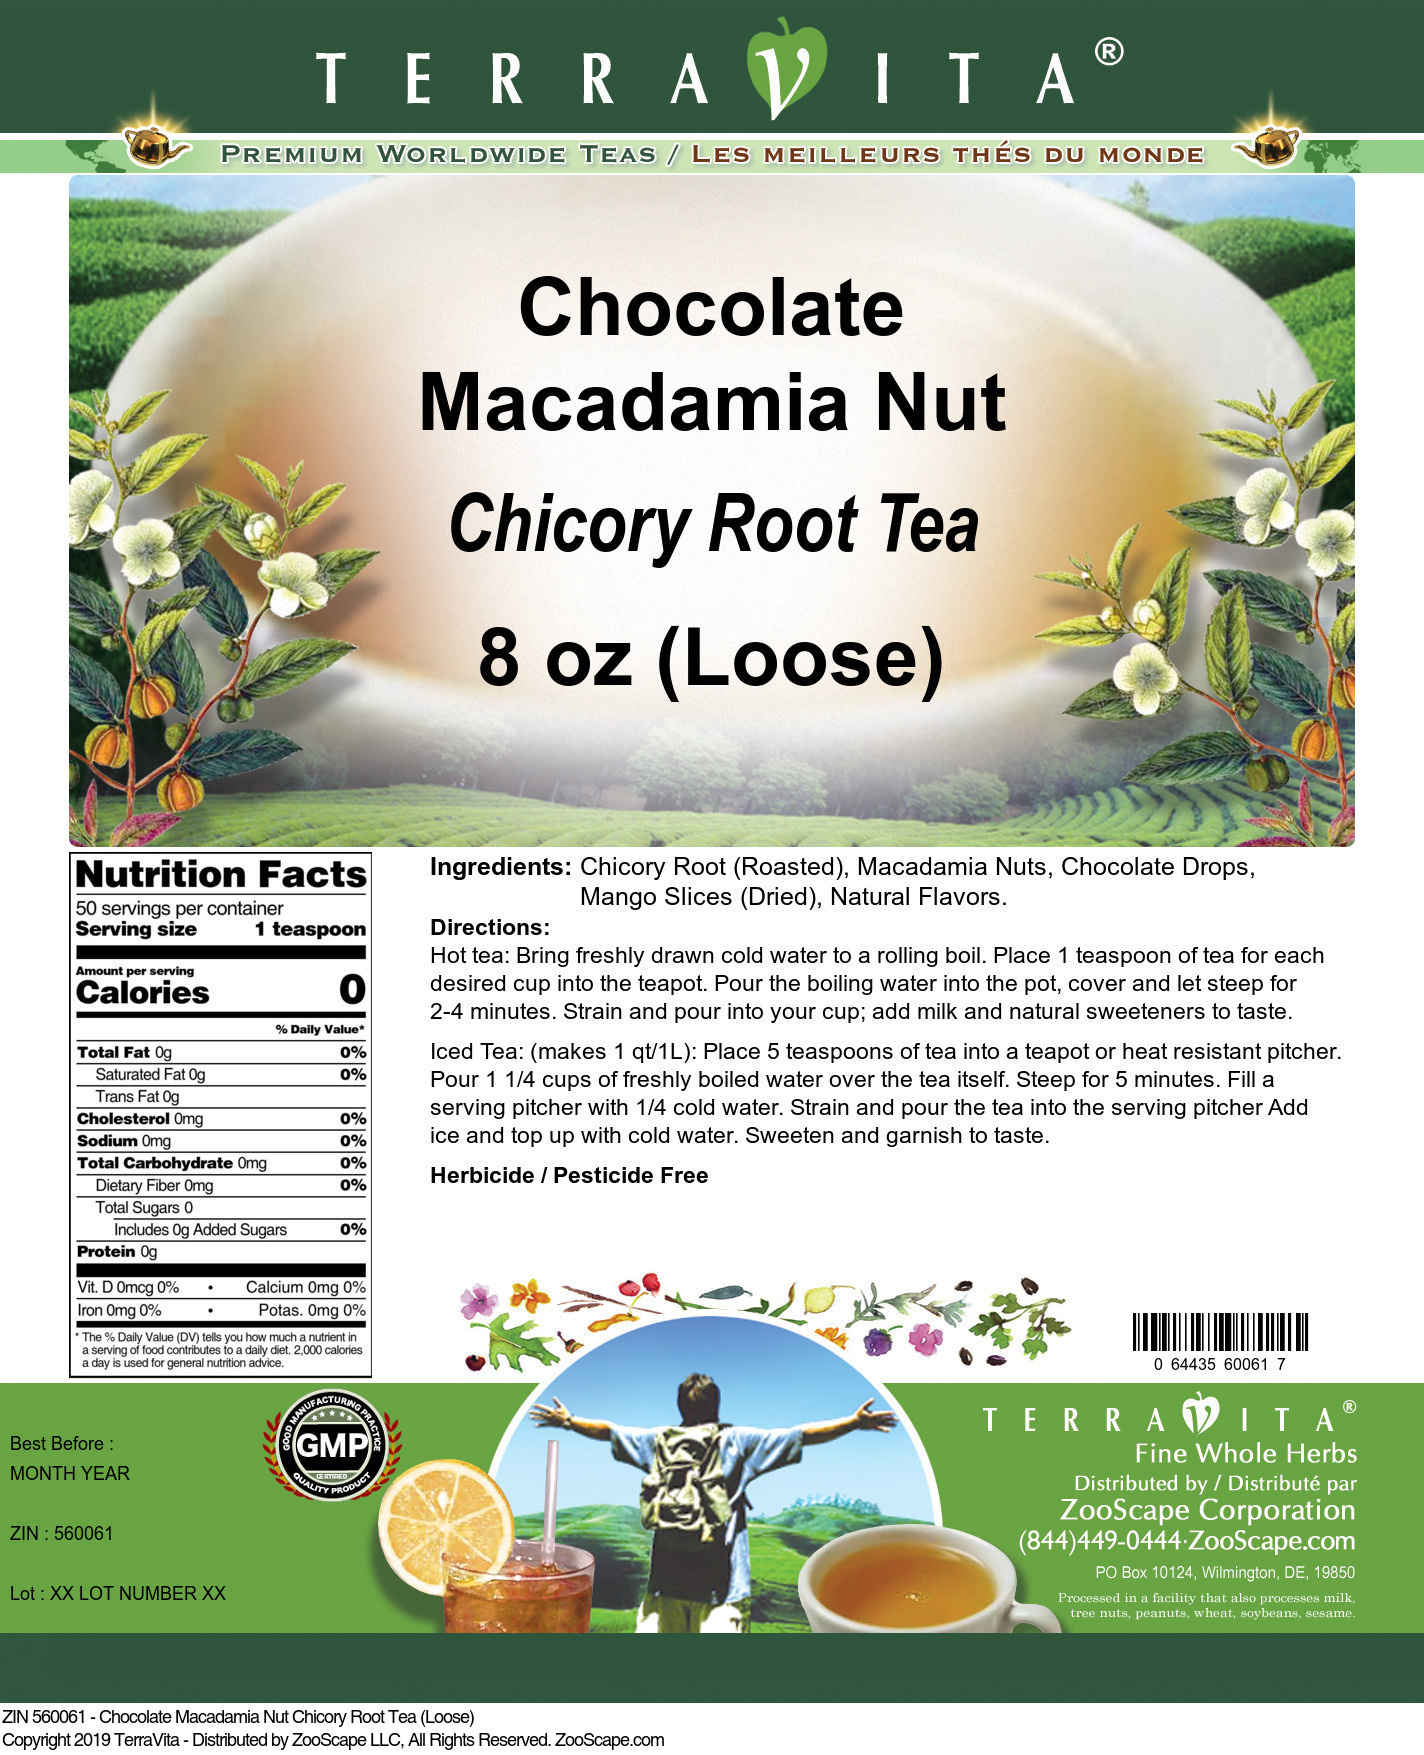 Chocolate Macadamia Nut Chicory Root Tea (Loose)